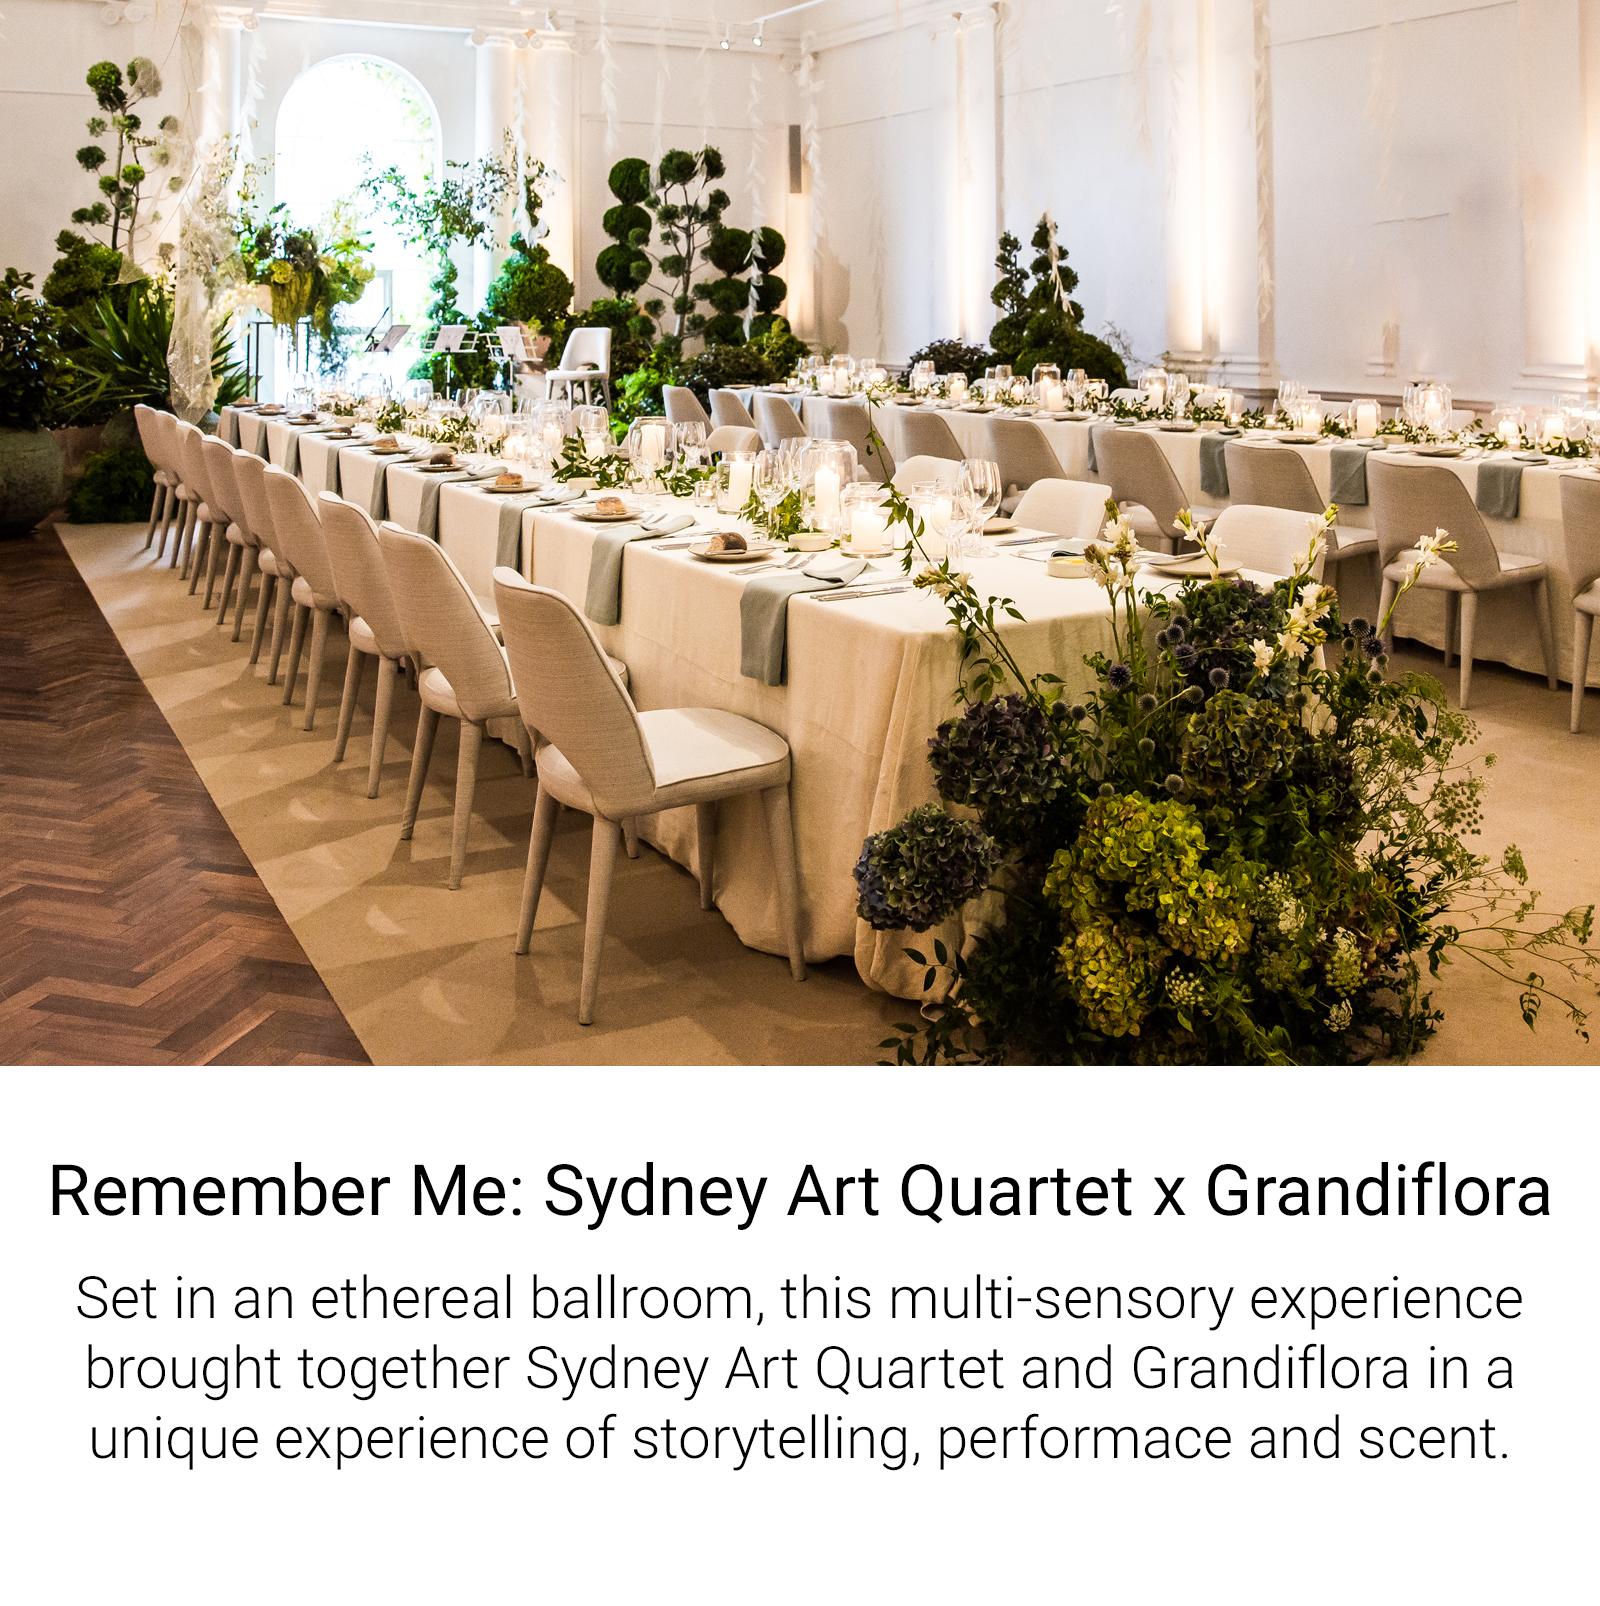 Sydney Art Quartet x Grandiflora